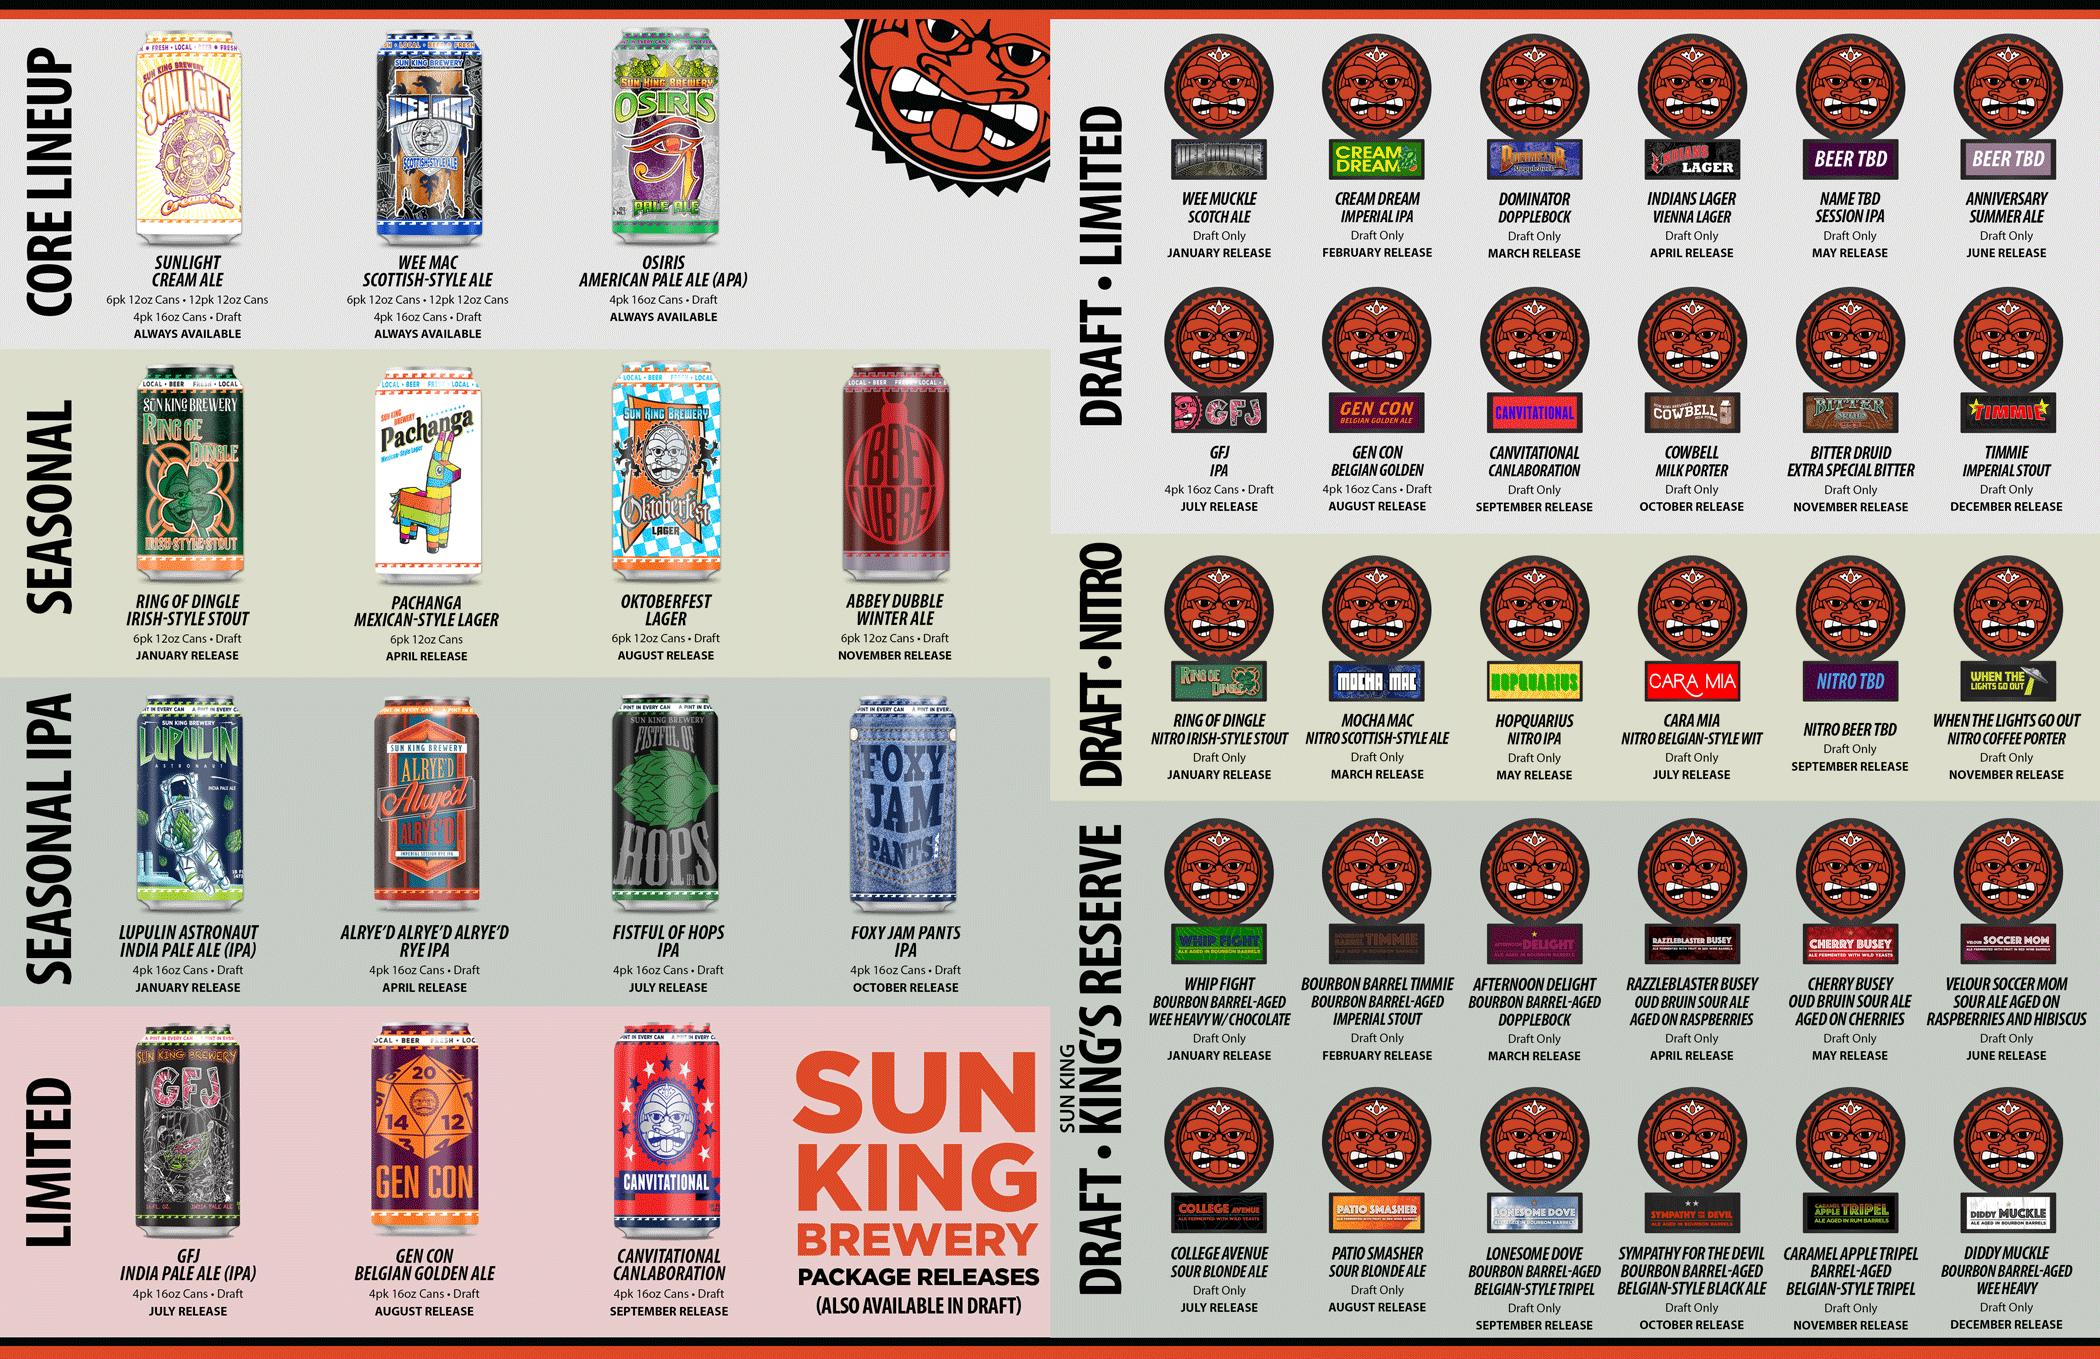 Sun King Brewery Beer Release Calendar 2017